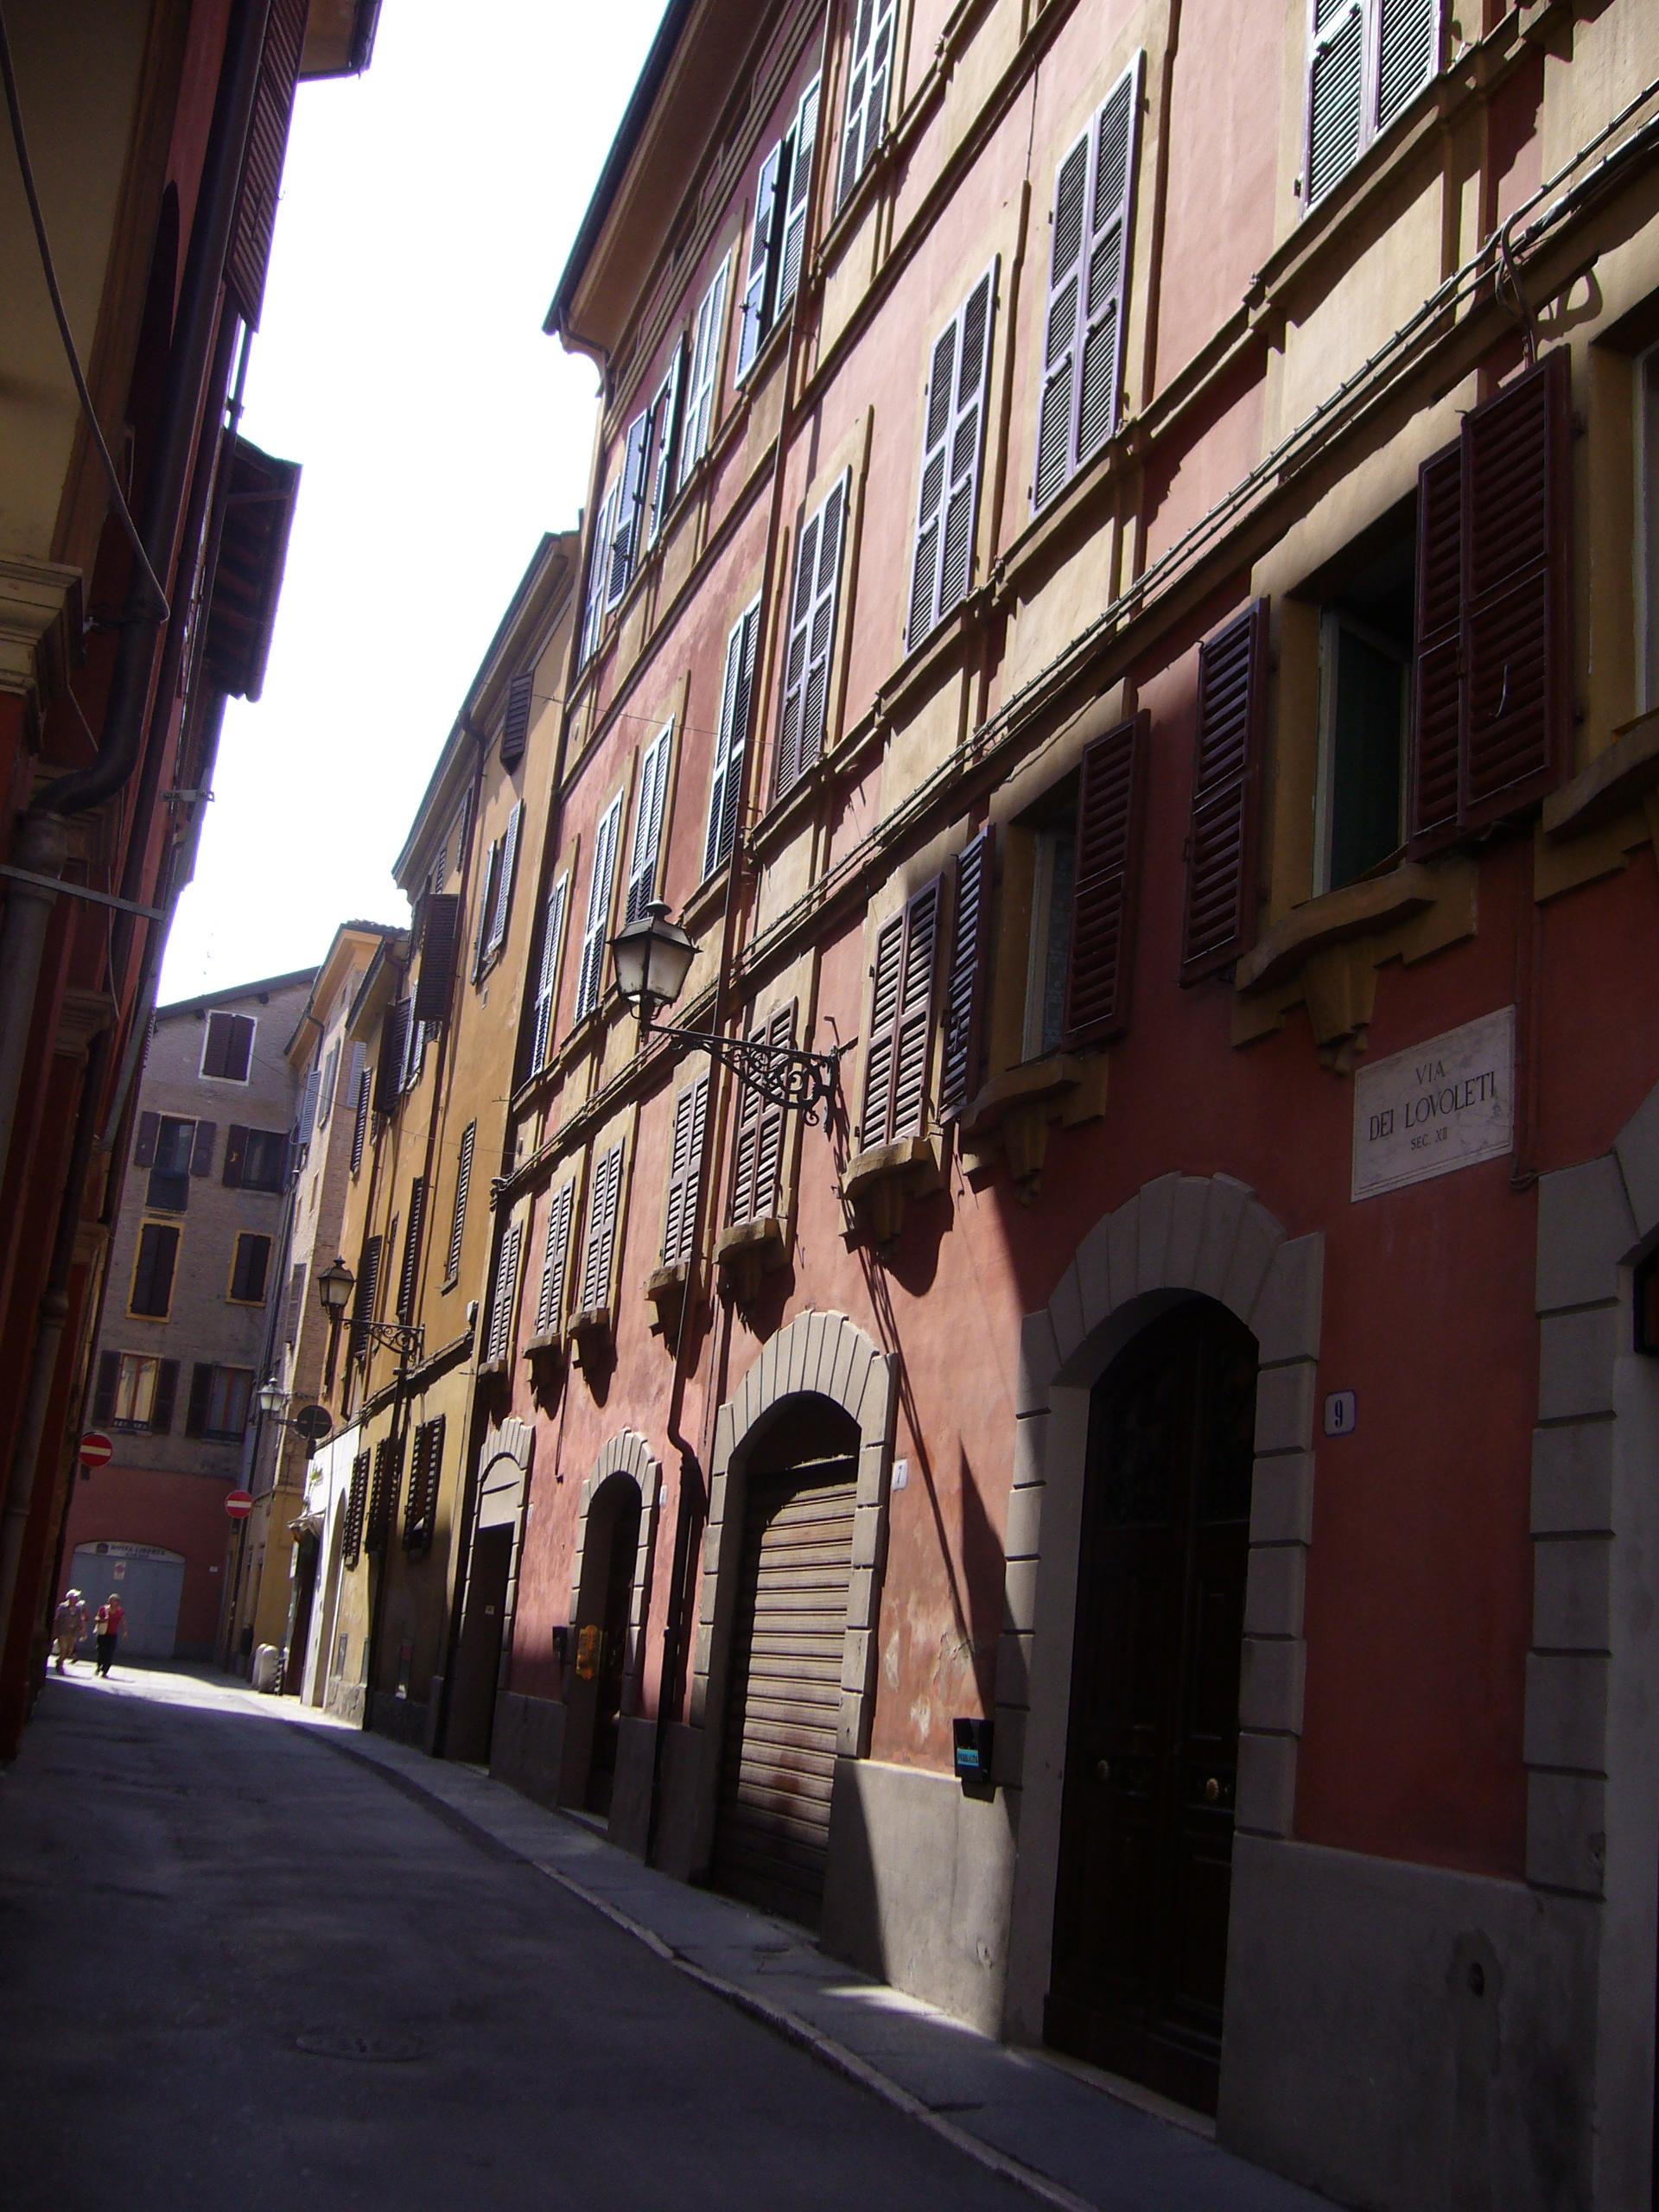 Things To Do in Galleria Estense, Restaurants in Galleria Estense